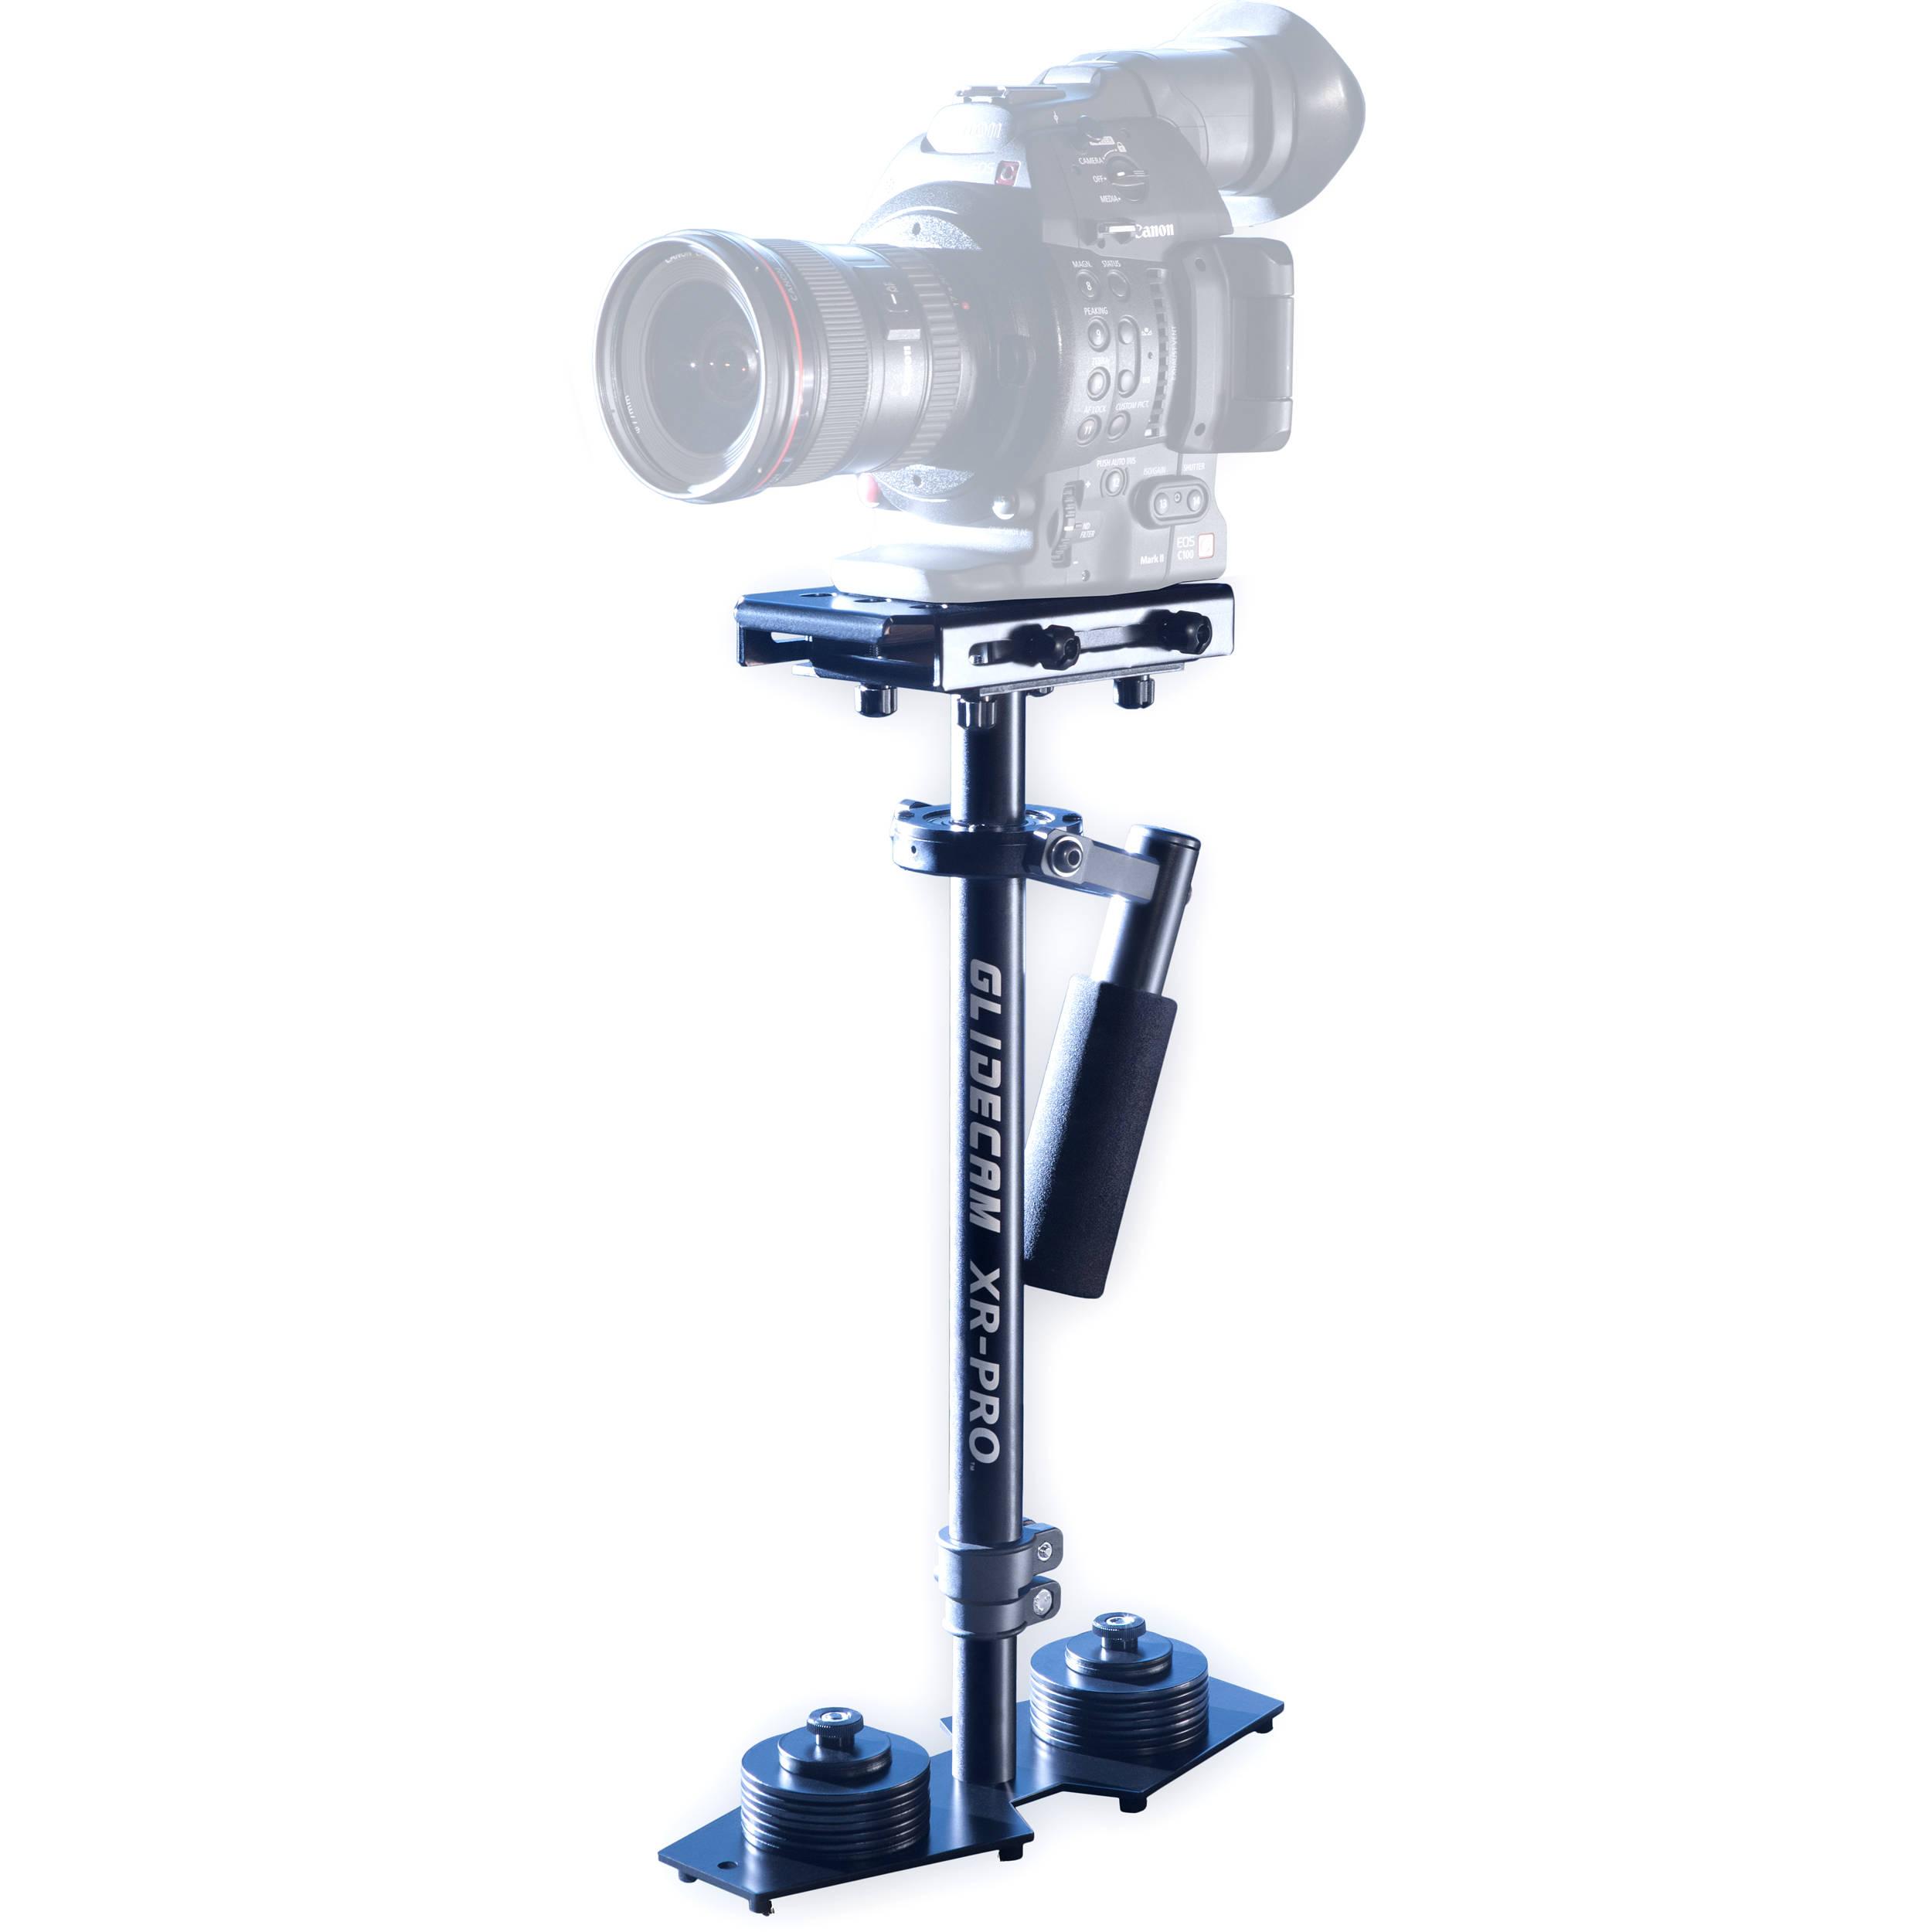 Glidecam XR-PRO Handheld Camera Stabilizer GLXRPRO B&H Photo